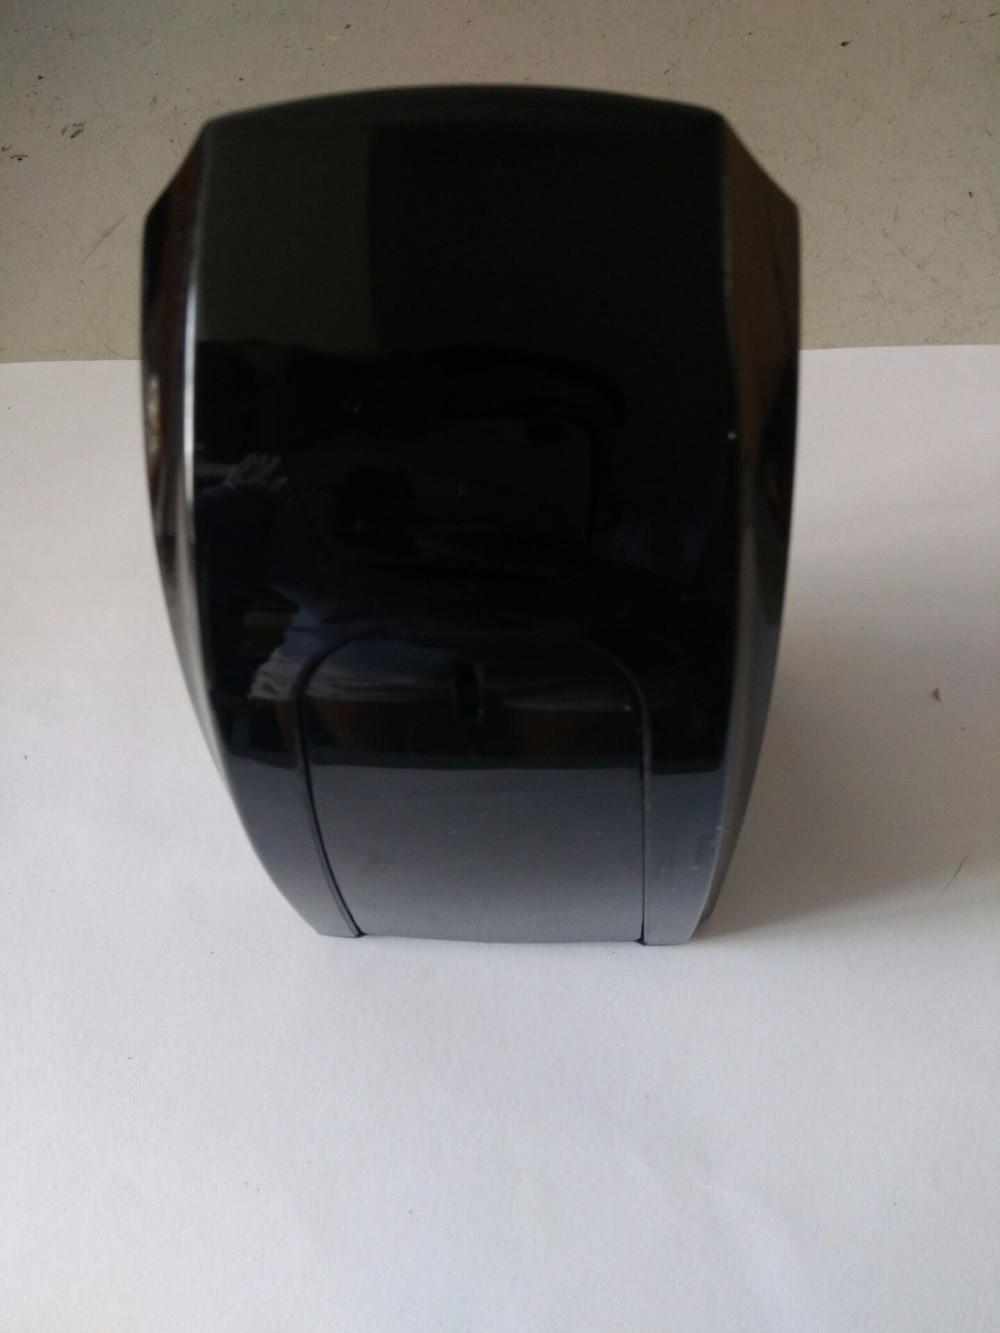 (FOR B6009) Virtual Blocker for Vacuum Cleaning Robot Liectroux B6009, 1pc/pack for x500 b2000 b3000 b2005 b2005 plus virtual blocker for vacuum cleaning robot 1pc pack